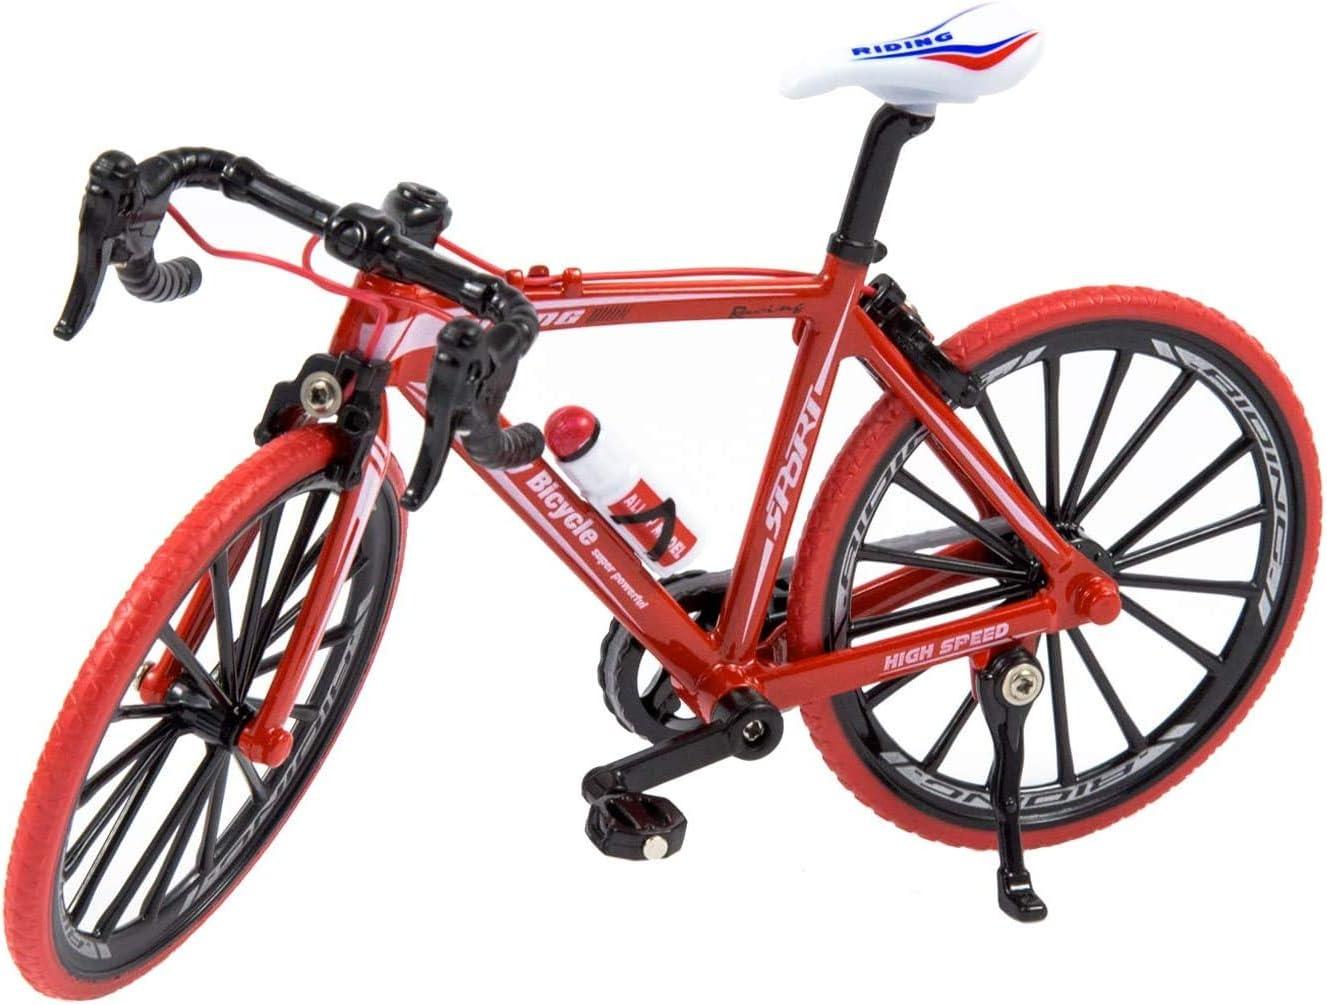 Speedrid Ebike Ergonomisches Elektrofahrrad Mini-Fahrrad Modell-Rot